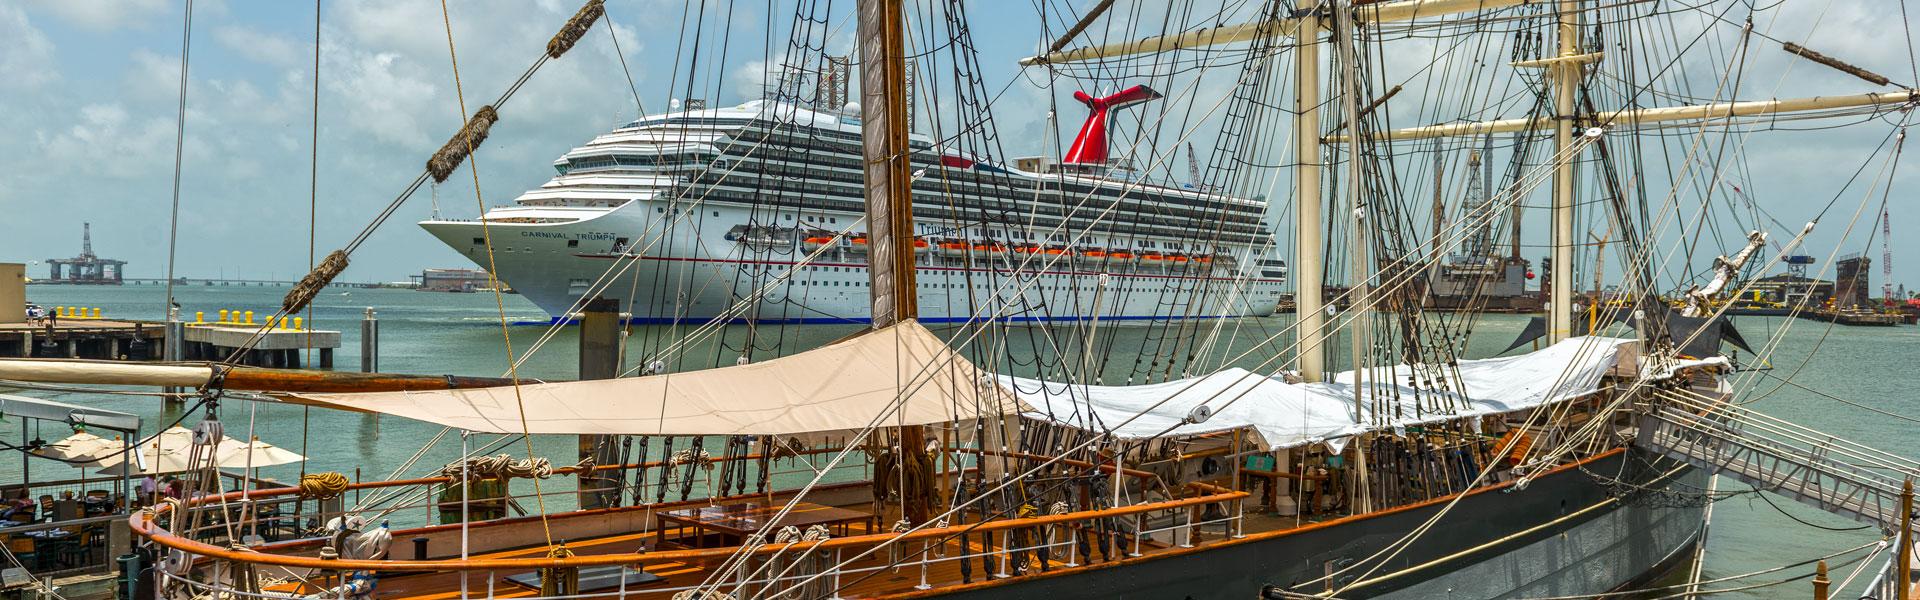 Cruise Ship and Elissa in Harbor, Galveston, TX